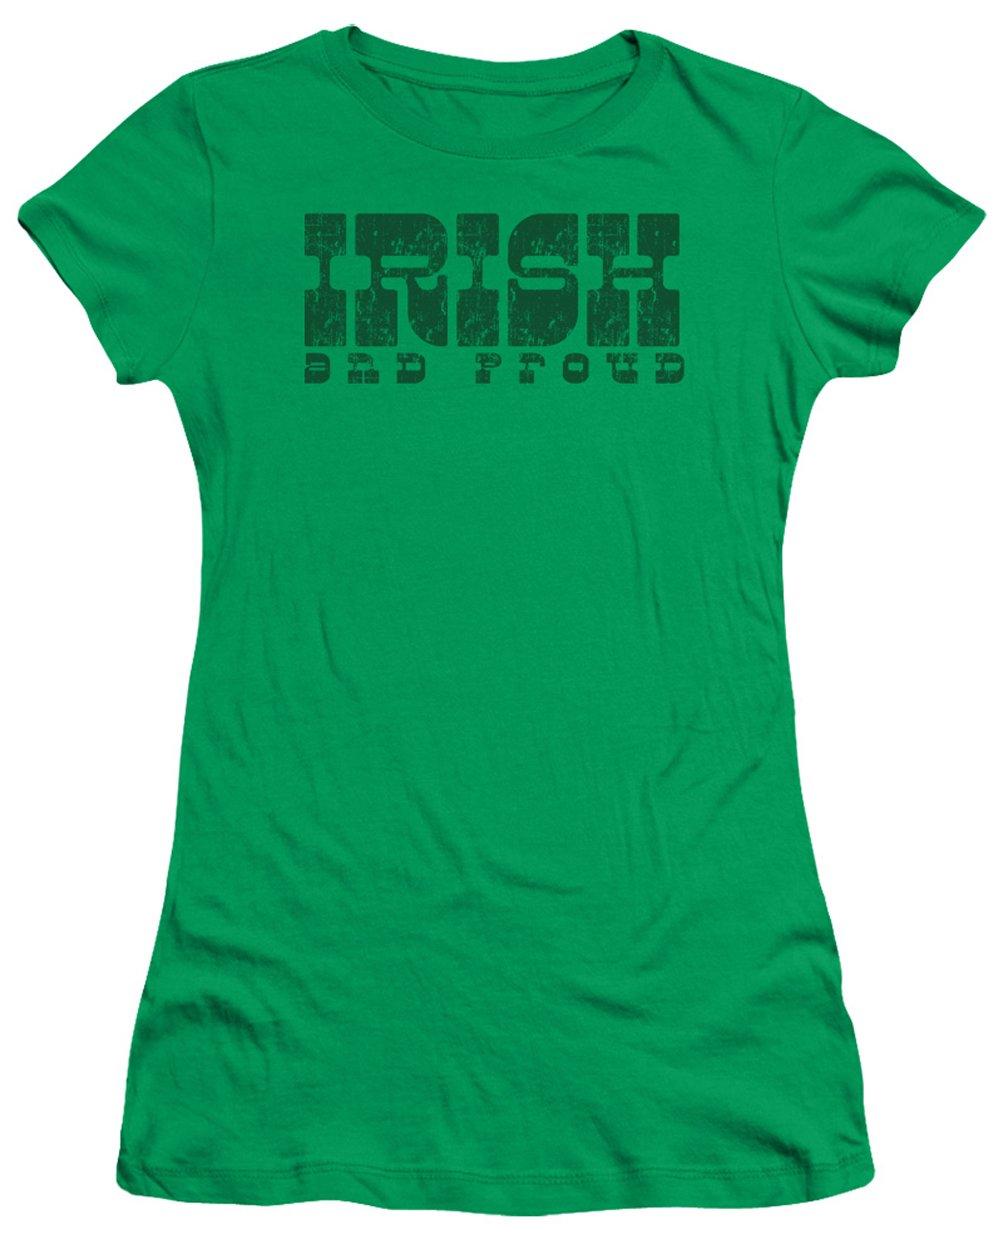 St Patrick S Day T Shirt Irish And Proud Shirt 1721